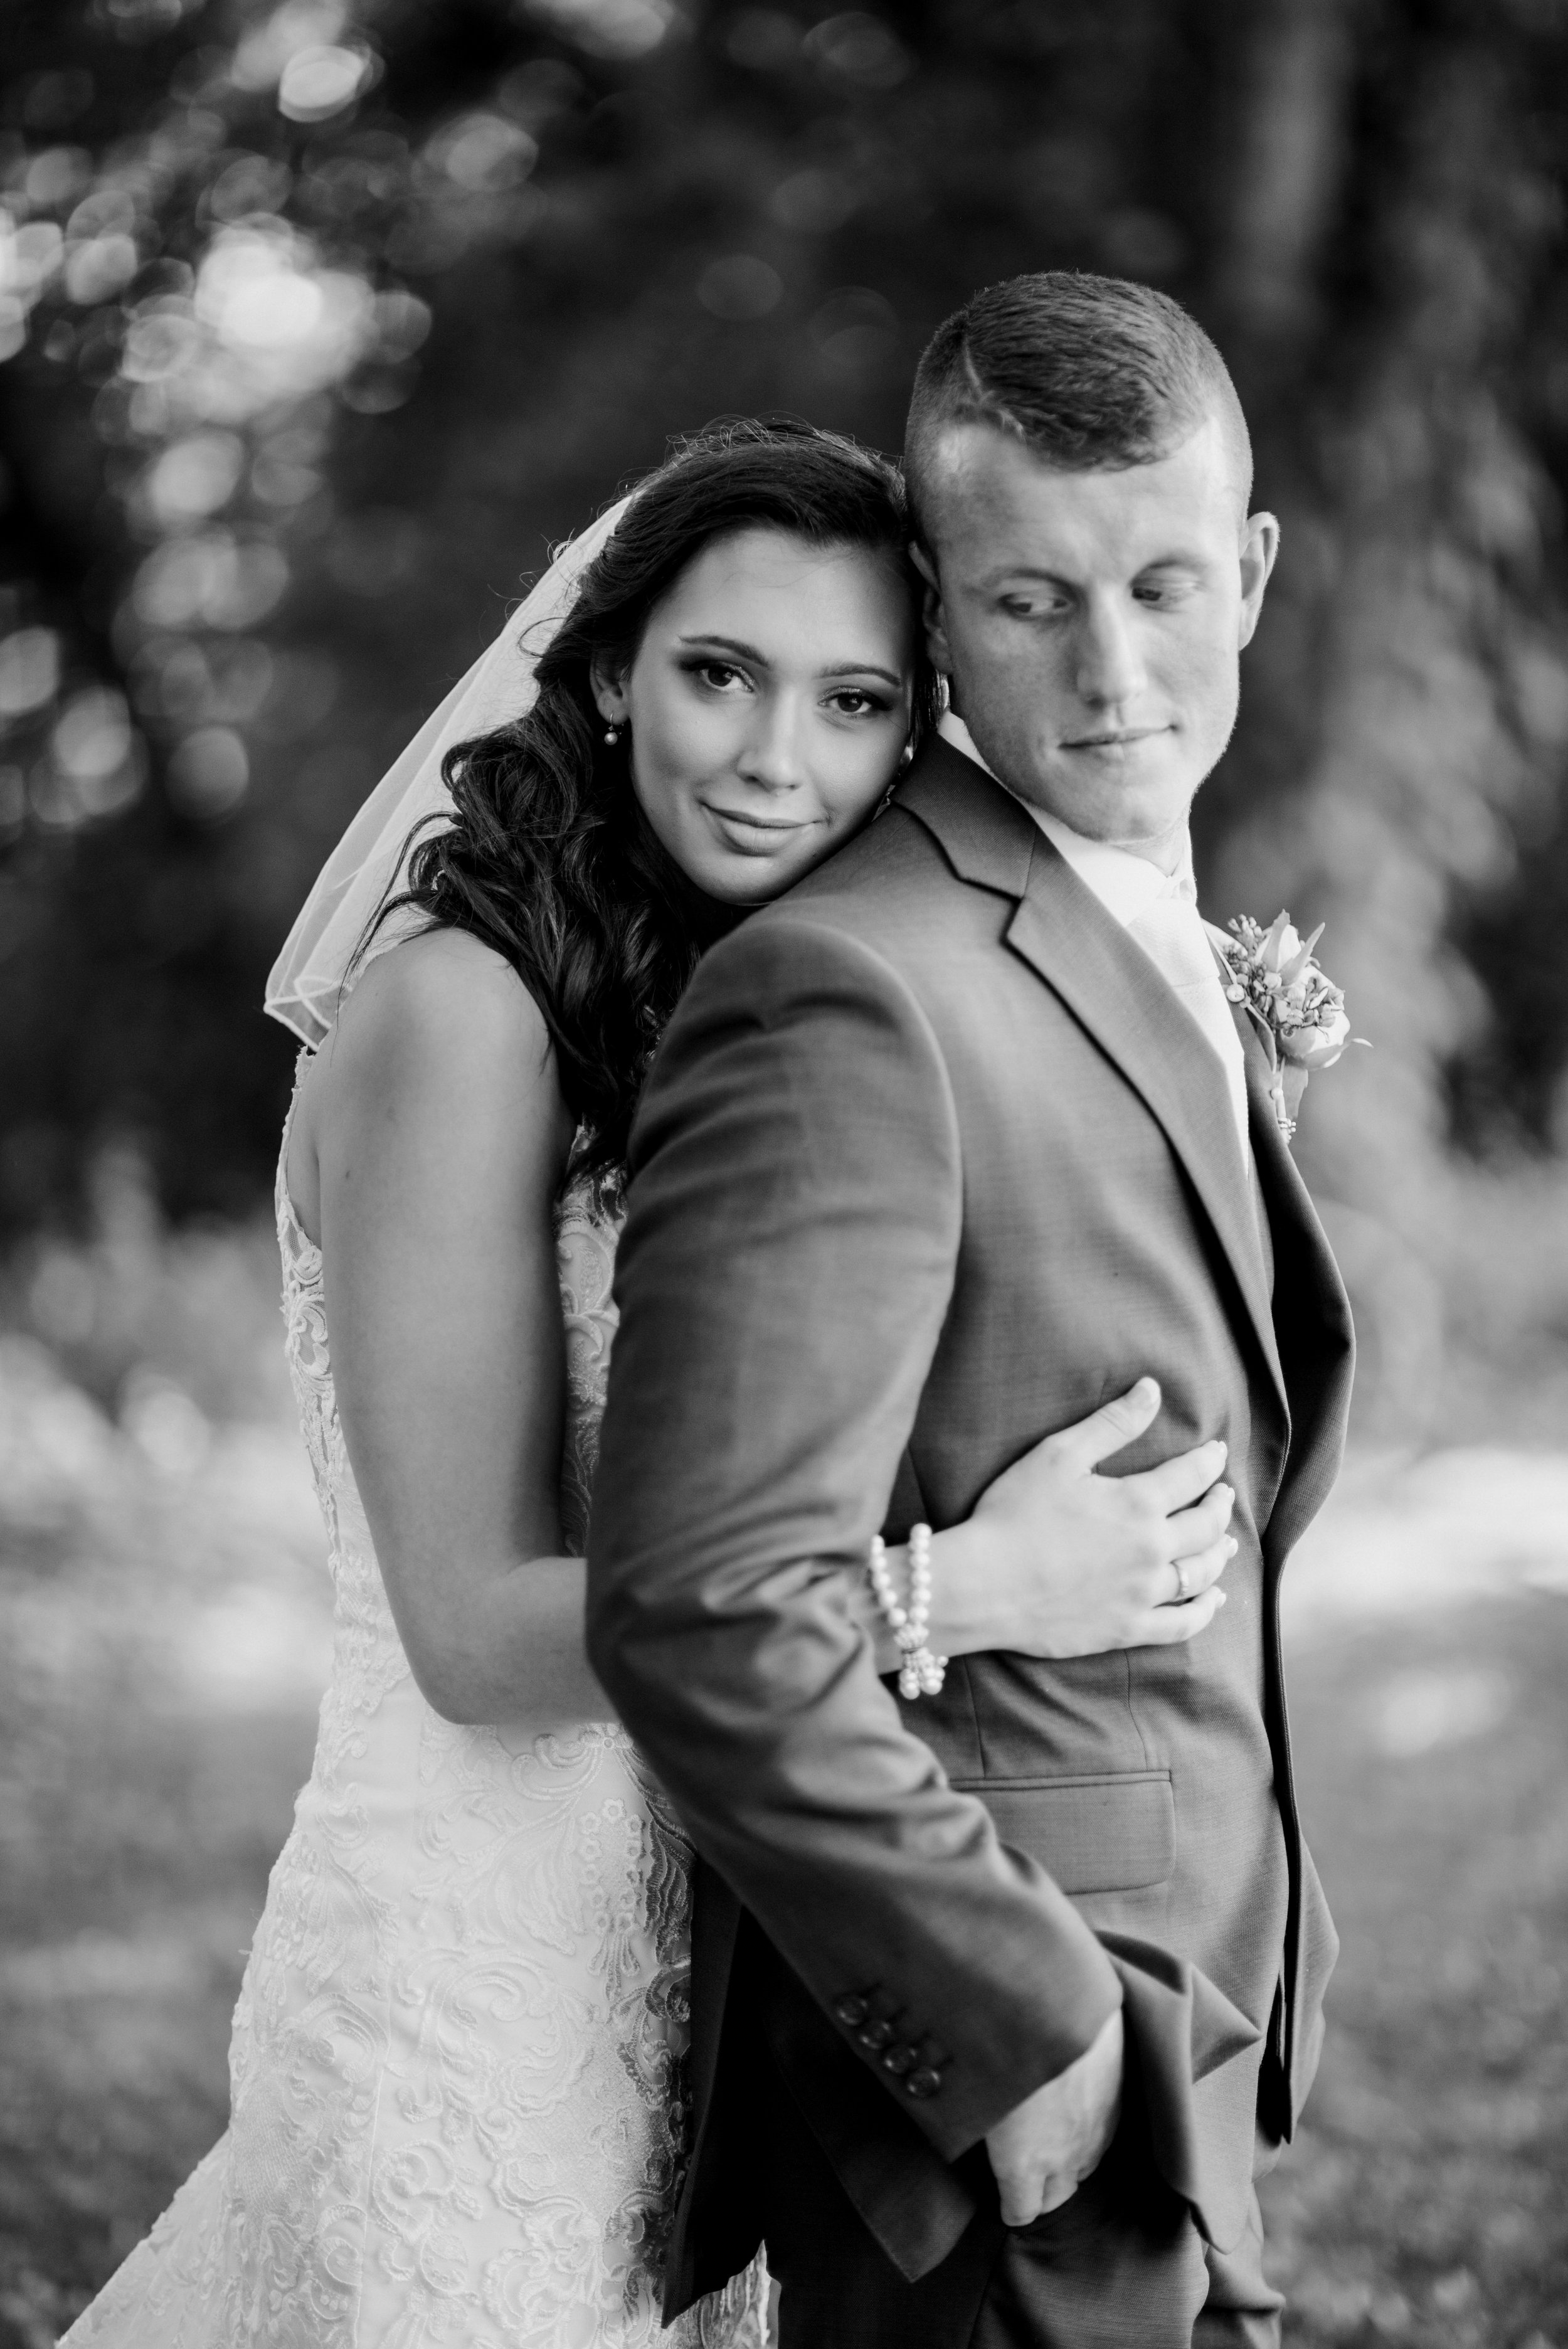 wedding-photographer-lexington-bright-photos